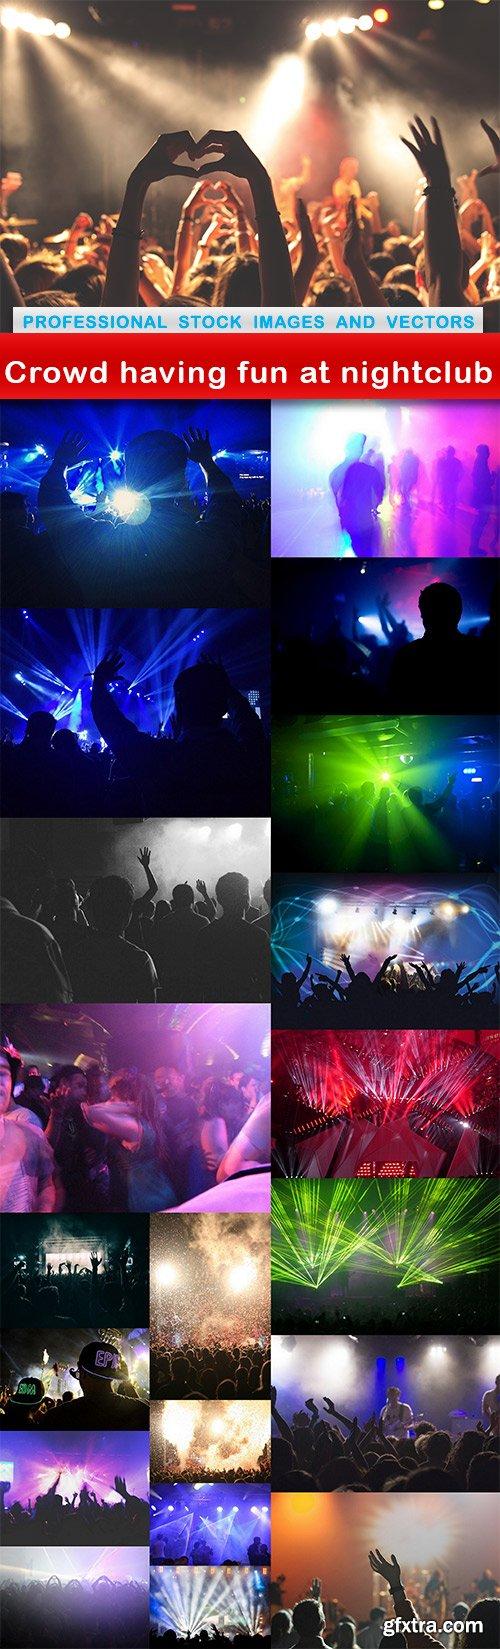 Crowd having fun at nightclub - 21 UHQ JPEG